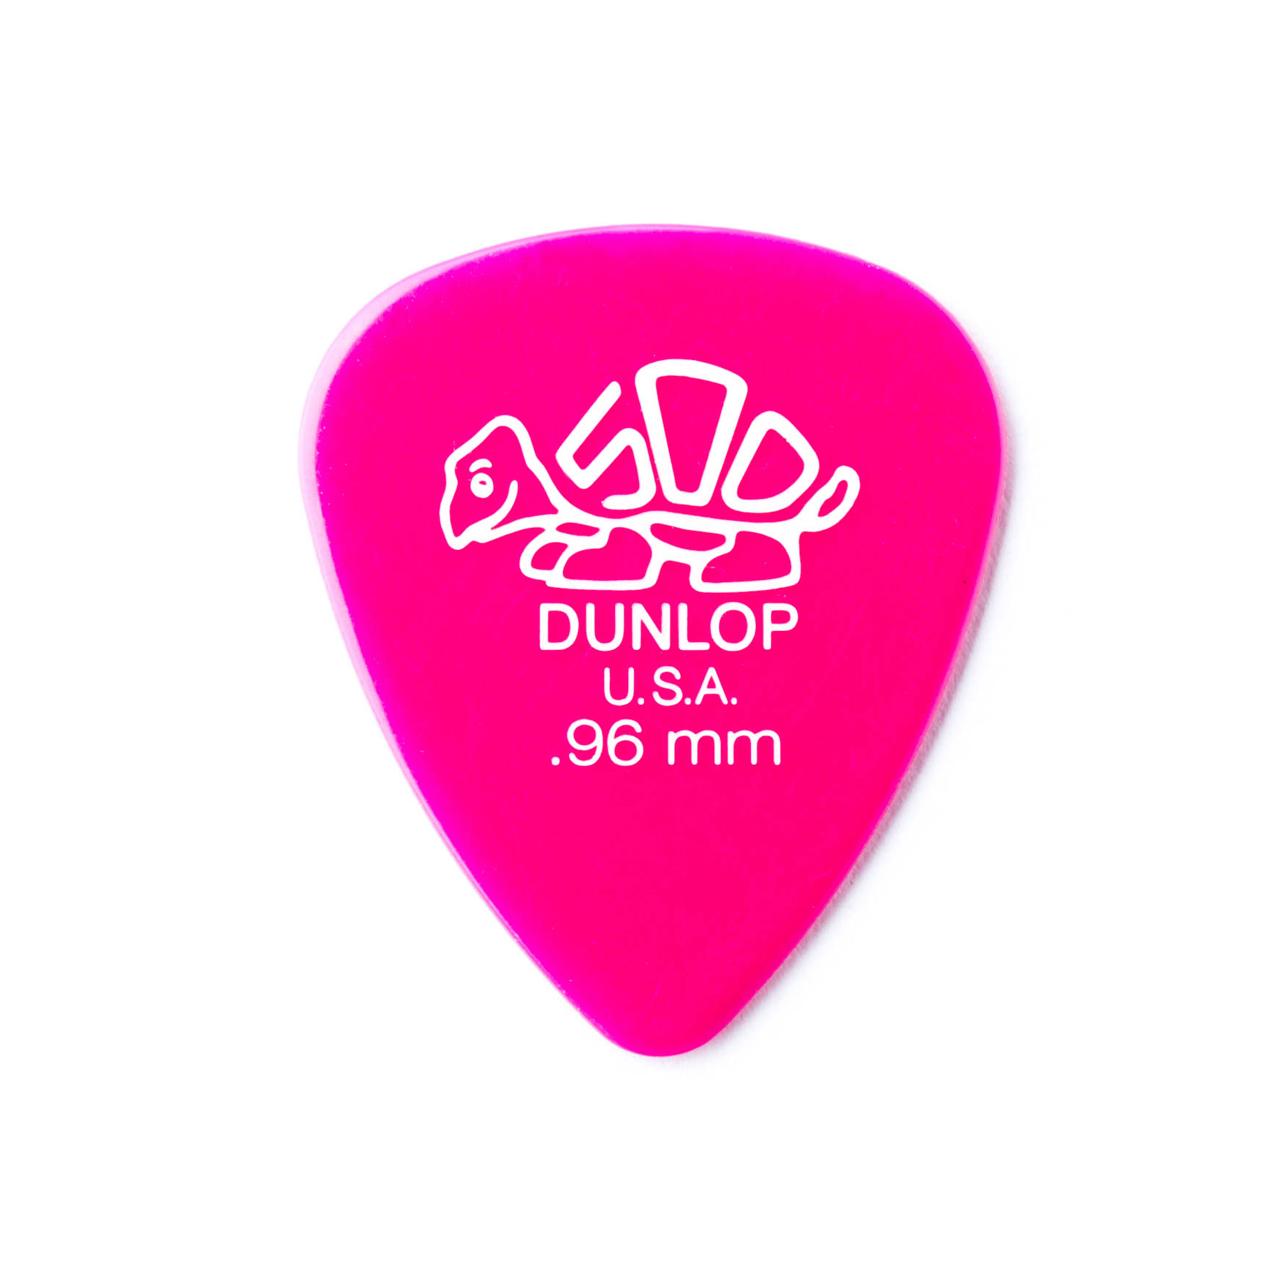 Palheta Delrin 500 0,96mm Pct C/12  41p.96 Dunlop  - Audio Video & cia